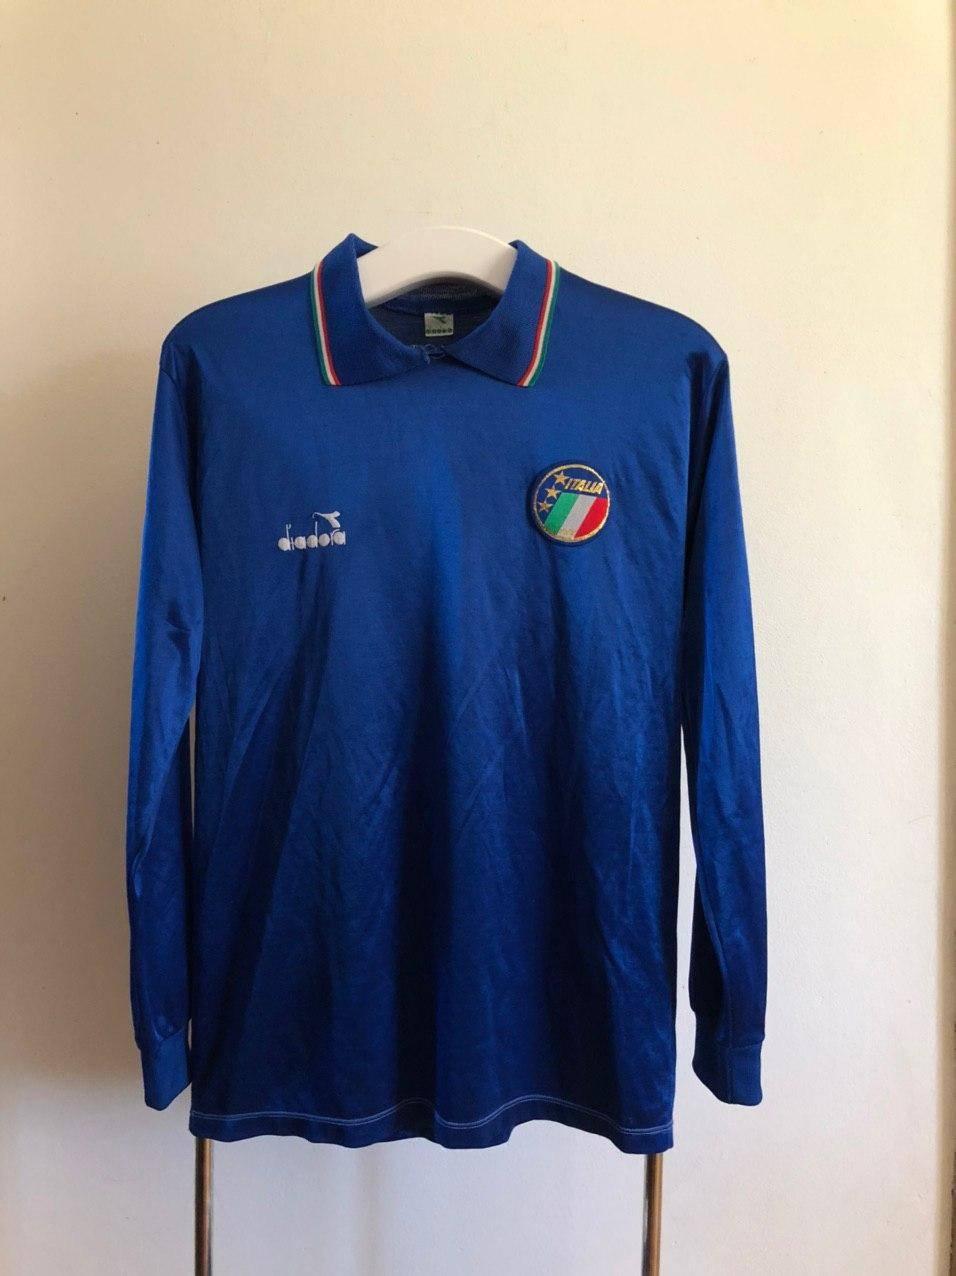 Vintage ITALY 1986 1990 FOOTBALL SOCCER JERSEY VINTAGE DIADORA